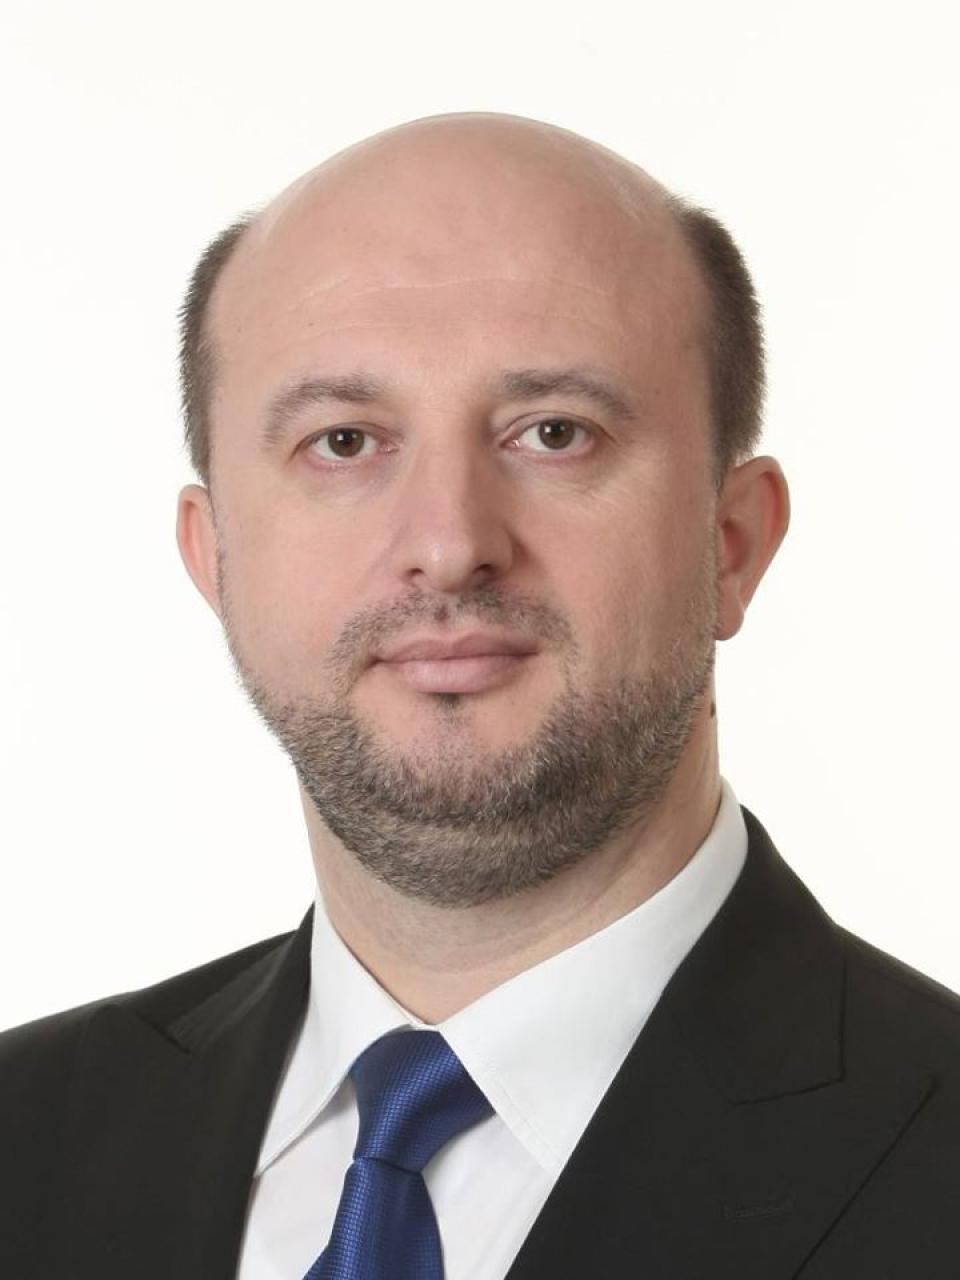 Daniel Chițoiu, fostul ministru de Finanțe. Foto Facebook